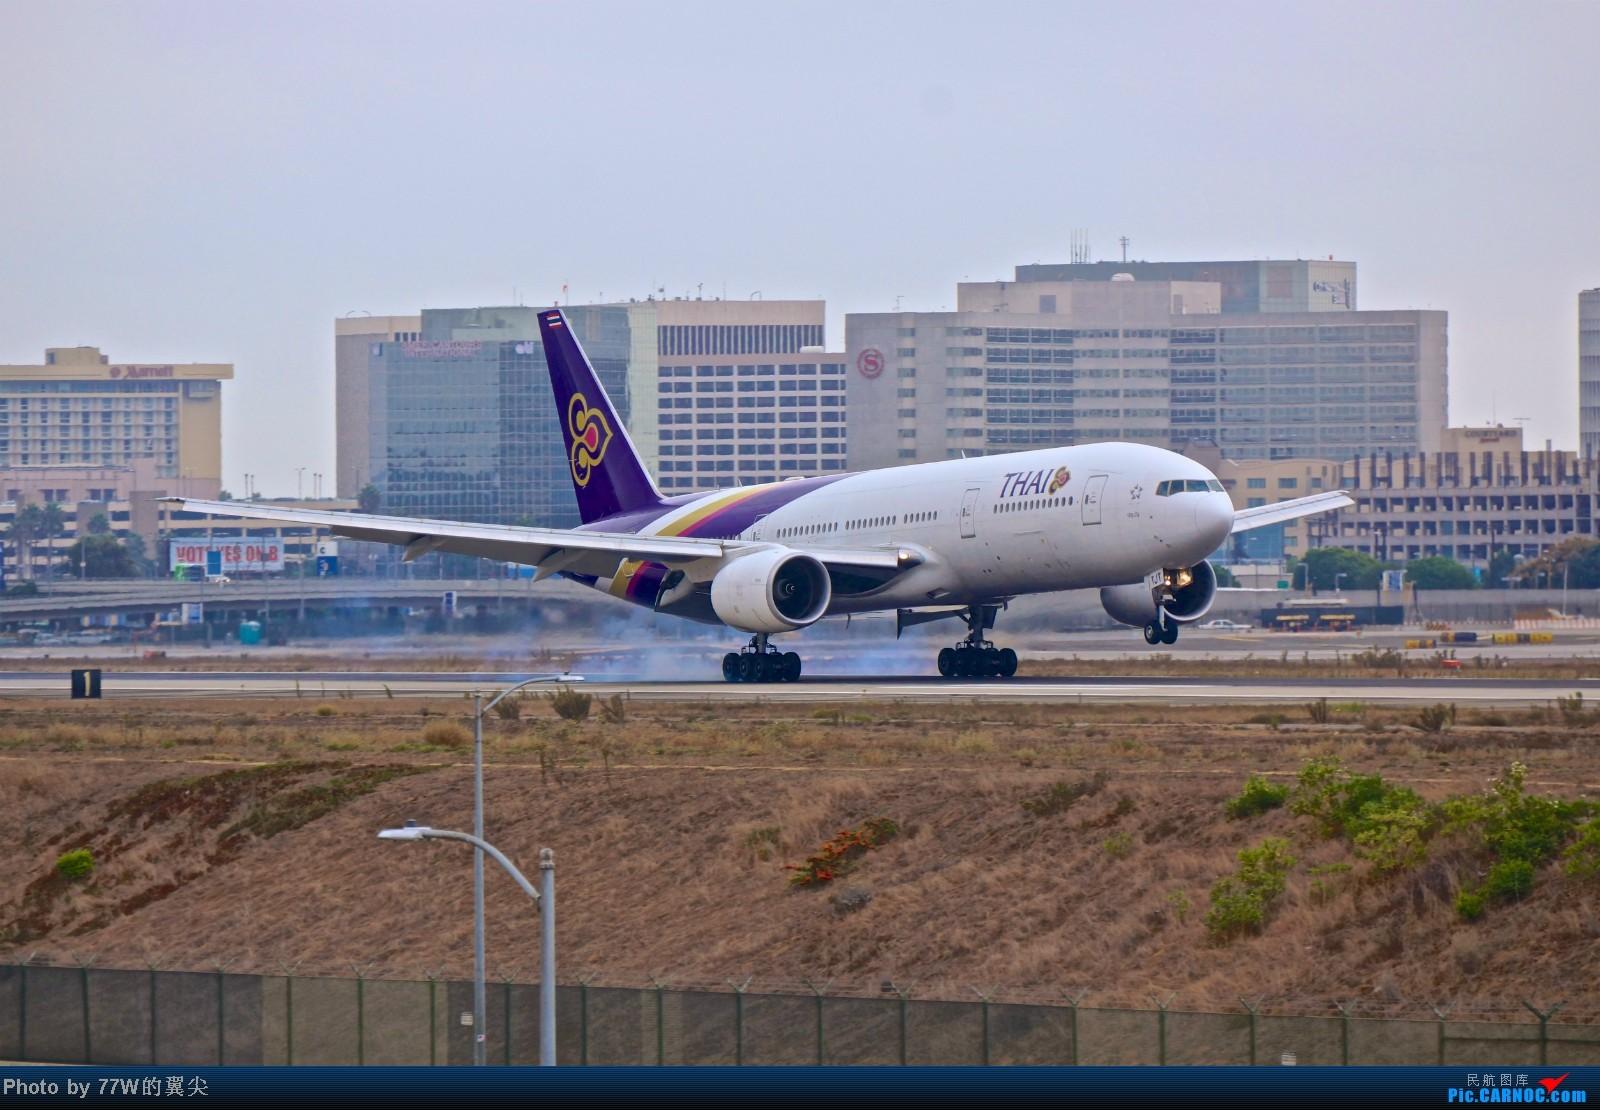 Re:[原创][LAX]---不一样的LAX ---阴天777合集  一次看个够 777-2D7/ER HS-TJT 美国洛杉矶机场